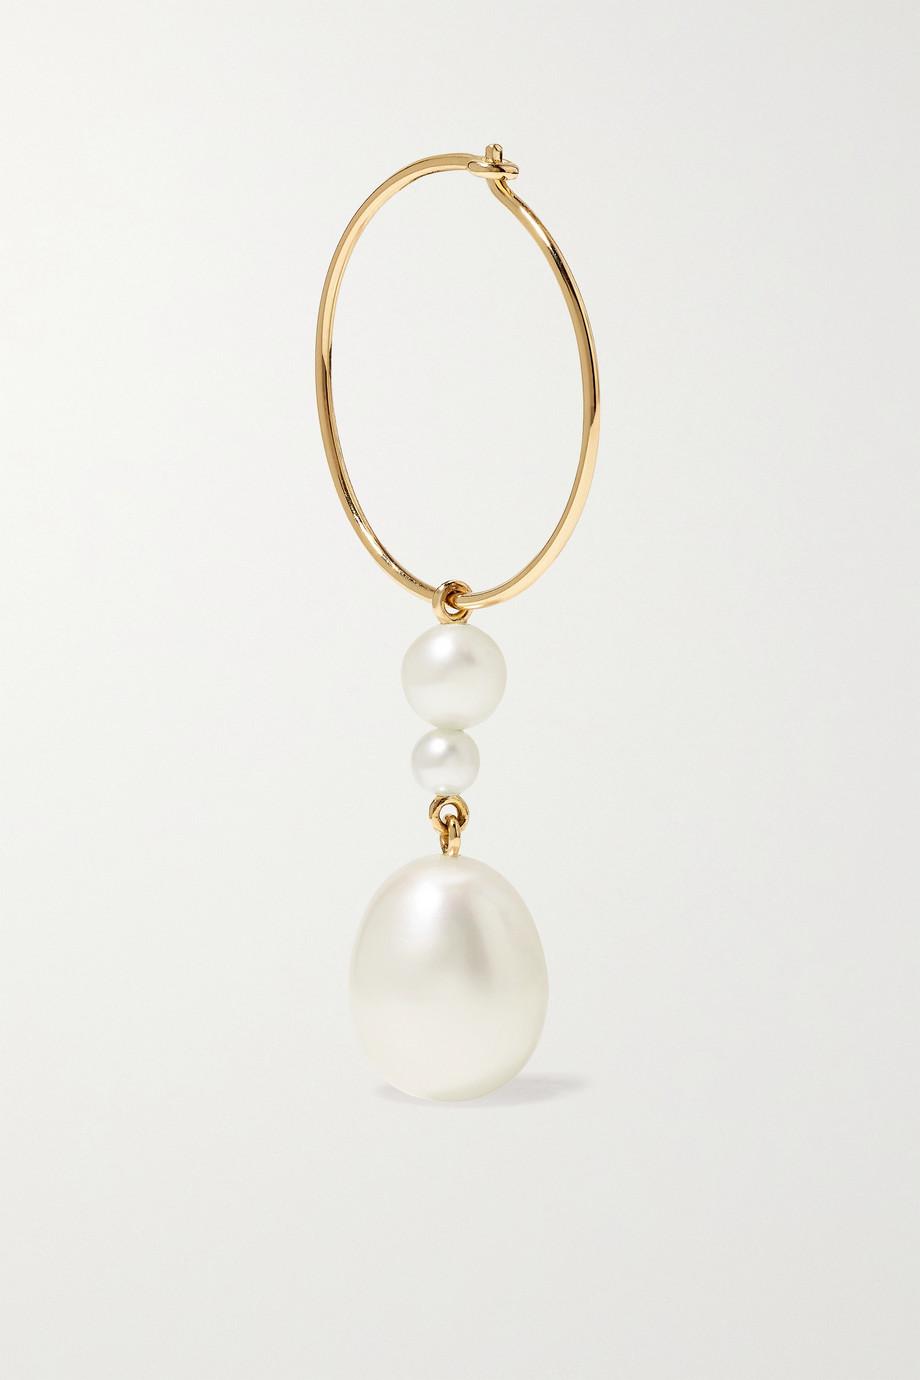 Sophie Bille Brahe L'Eau 14-karat gold pearl single hoop earring